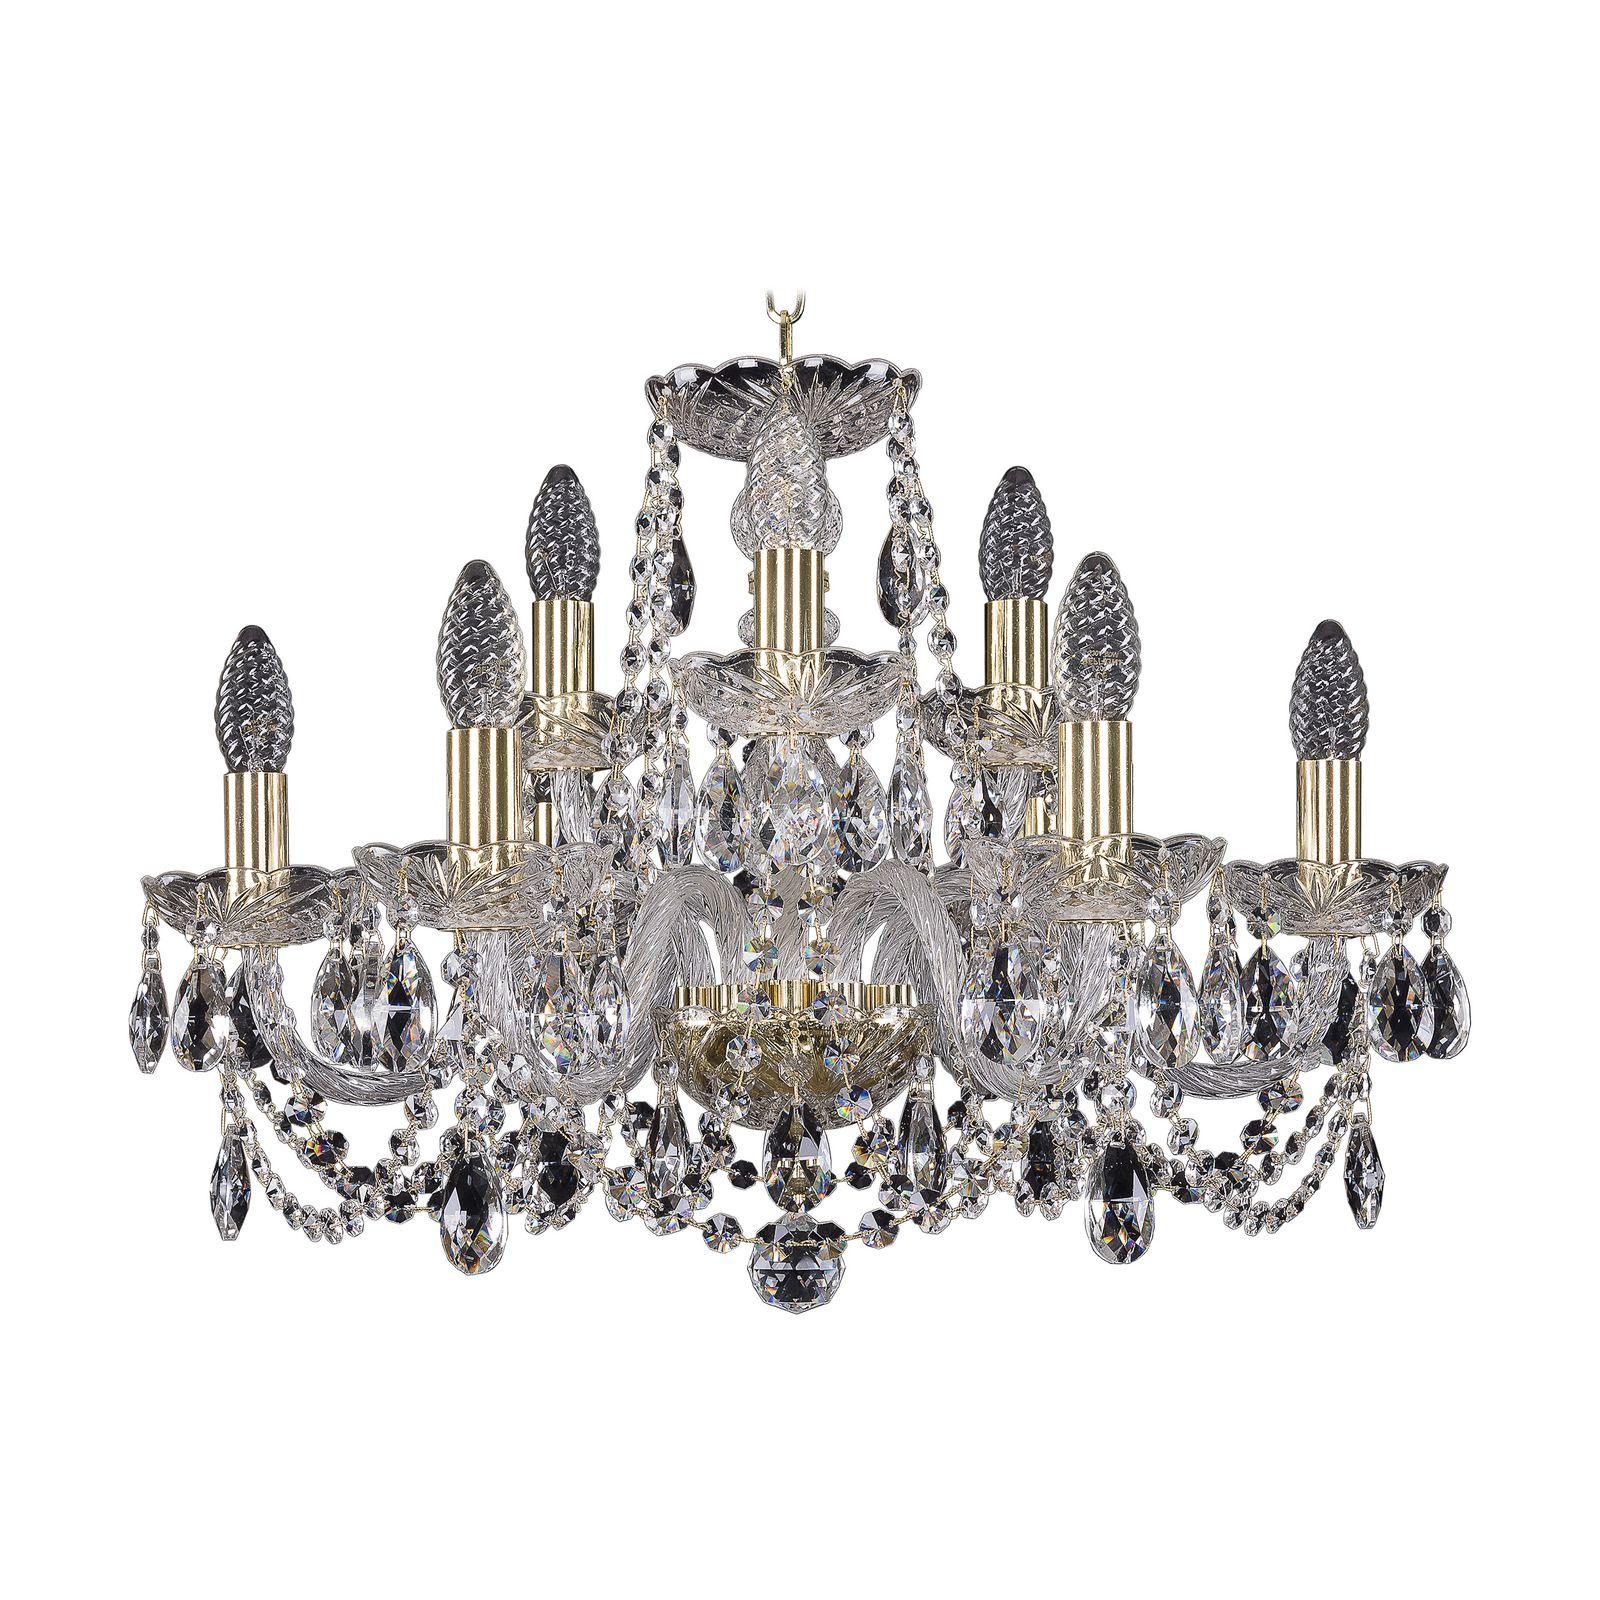 Потолочный светильник Bohemia Ivele Crystal 1402/6+3/195 G, E14, 40 Вт bohemia ivele crystal 1932 75z g